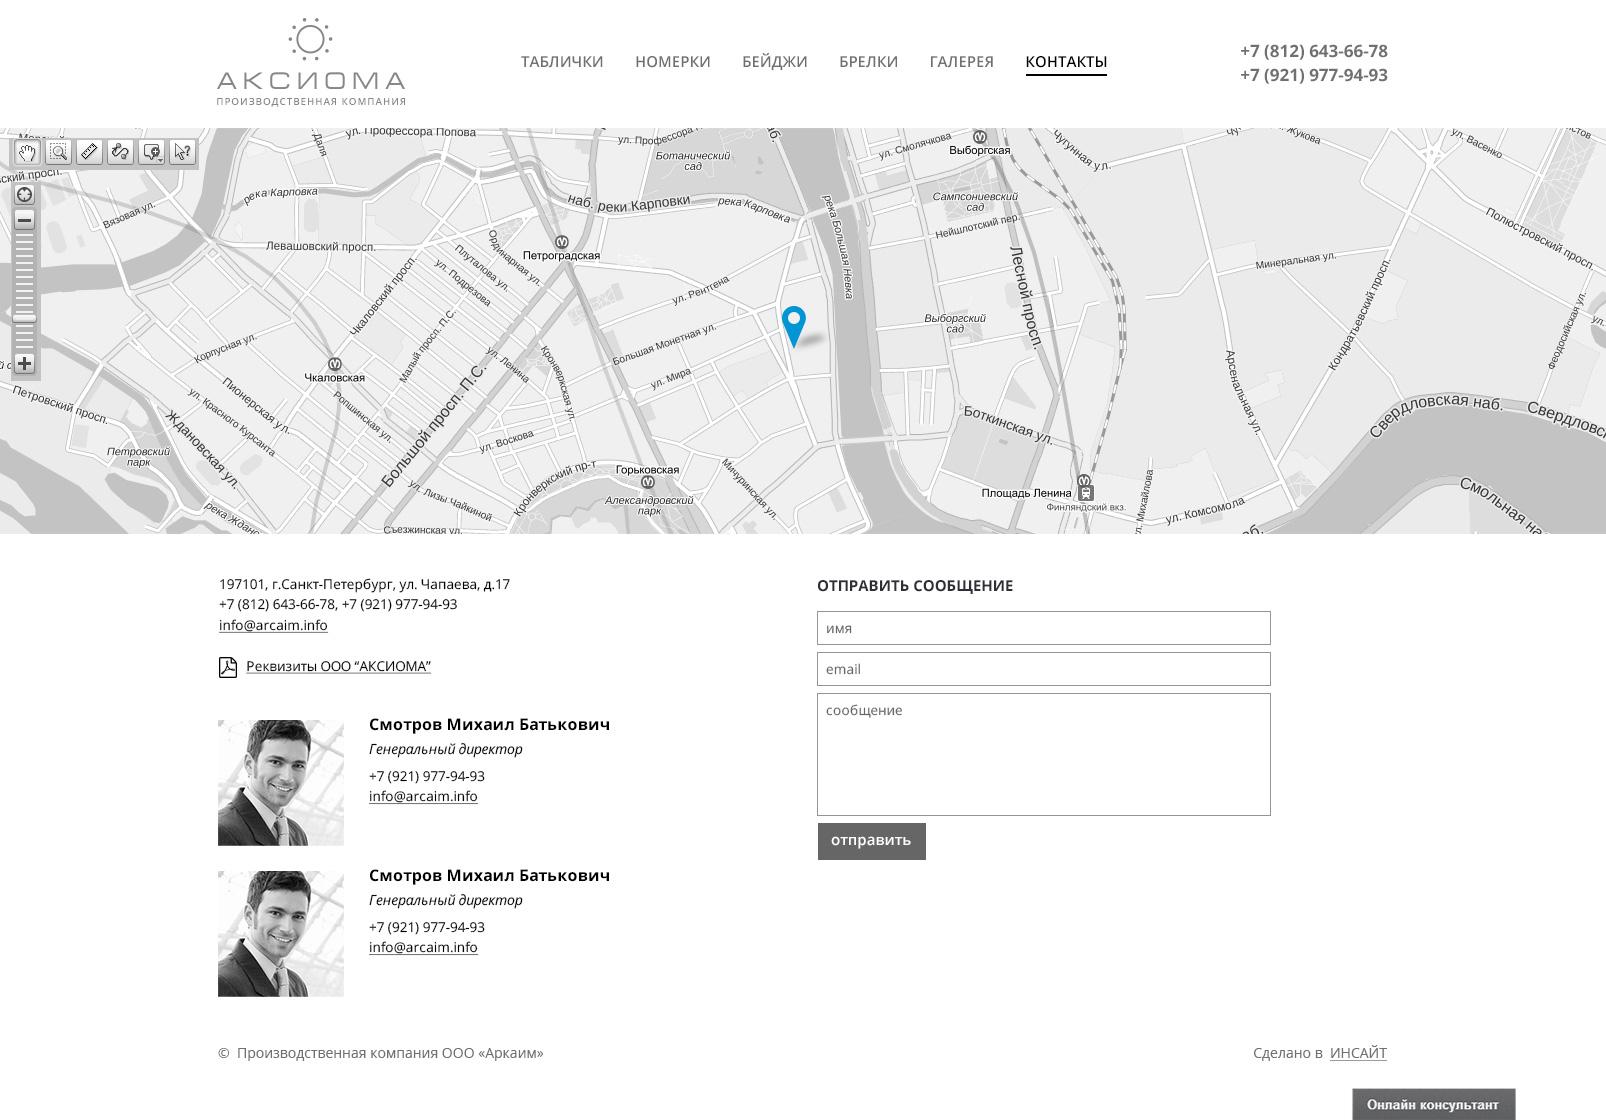 Разработка сайта, под ключ, производственная компания, АКСИОМА